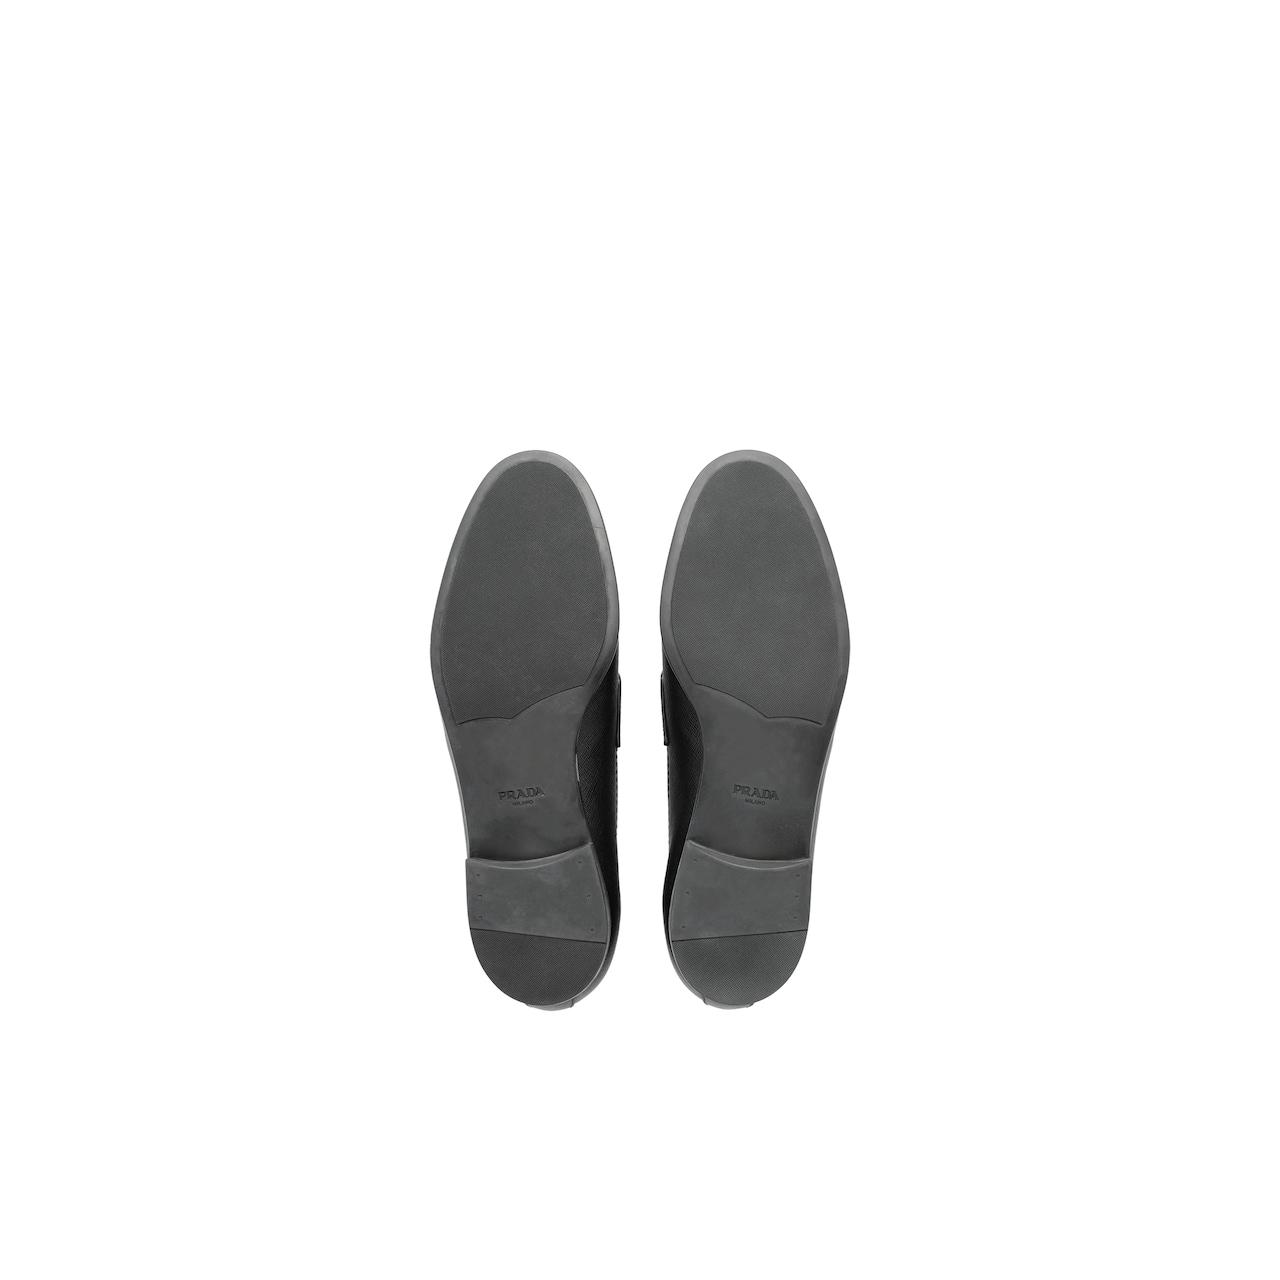 Prada Saffiano leather loafers 5